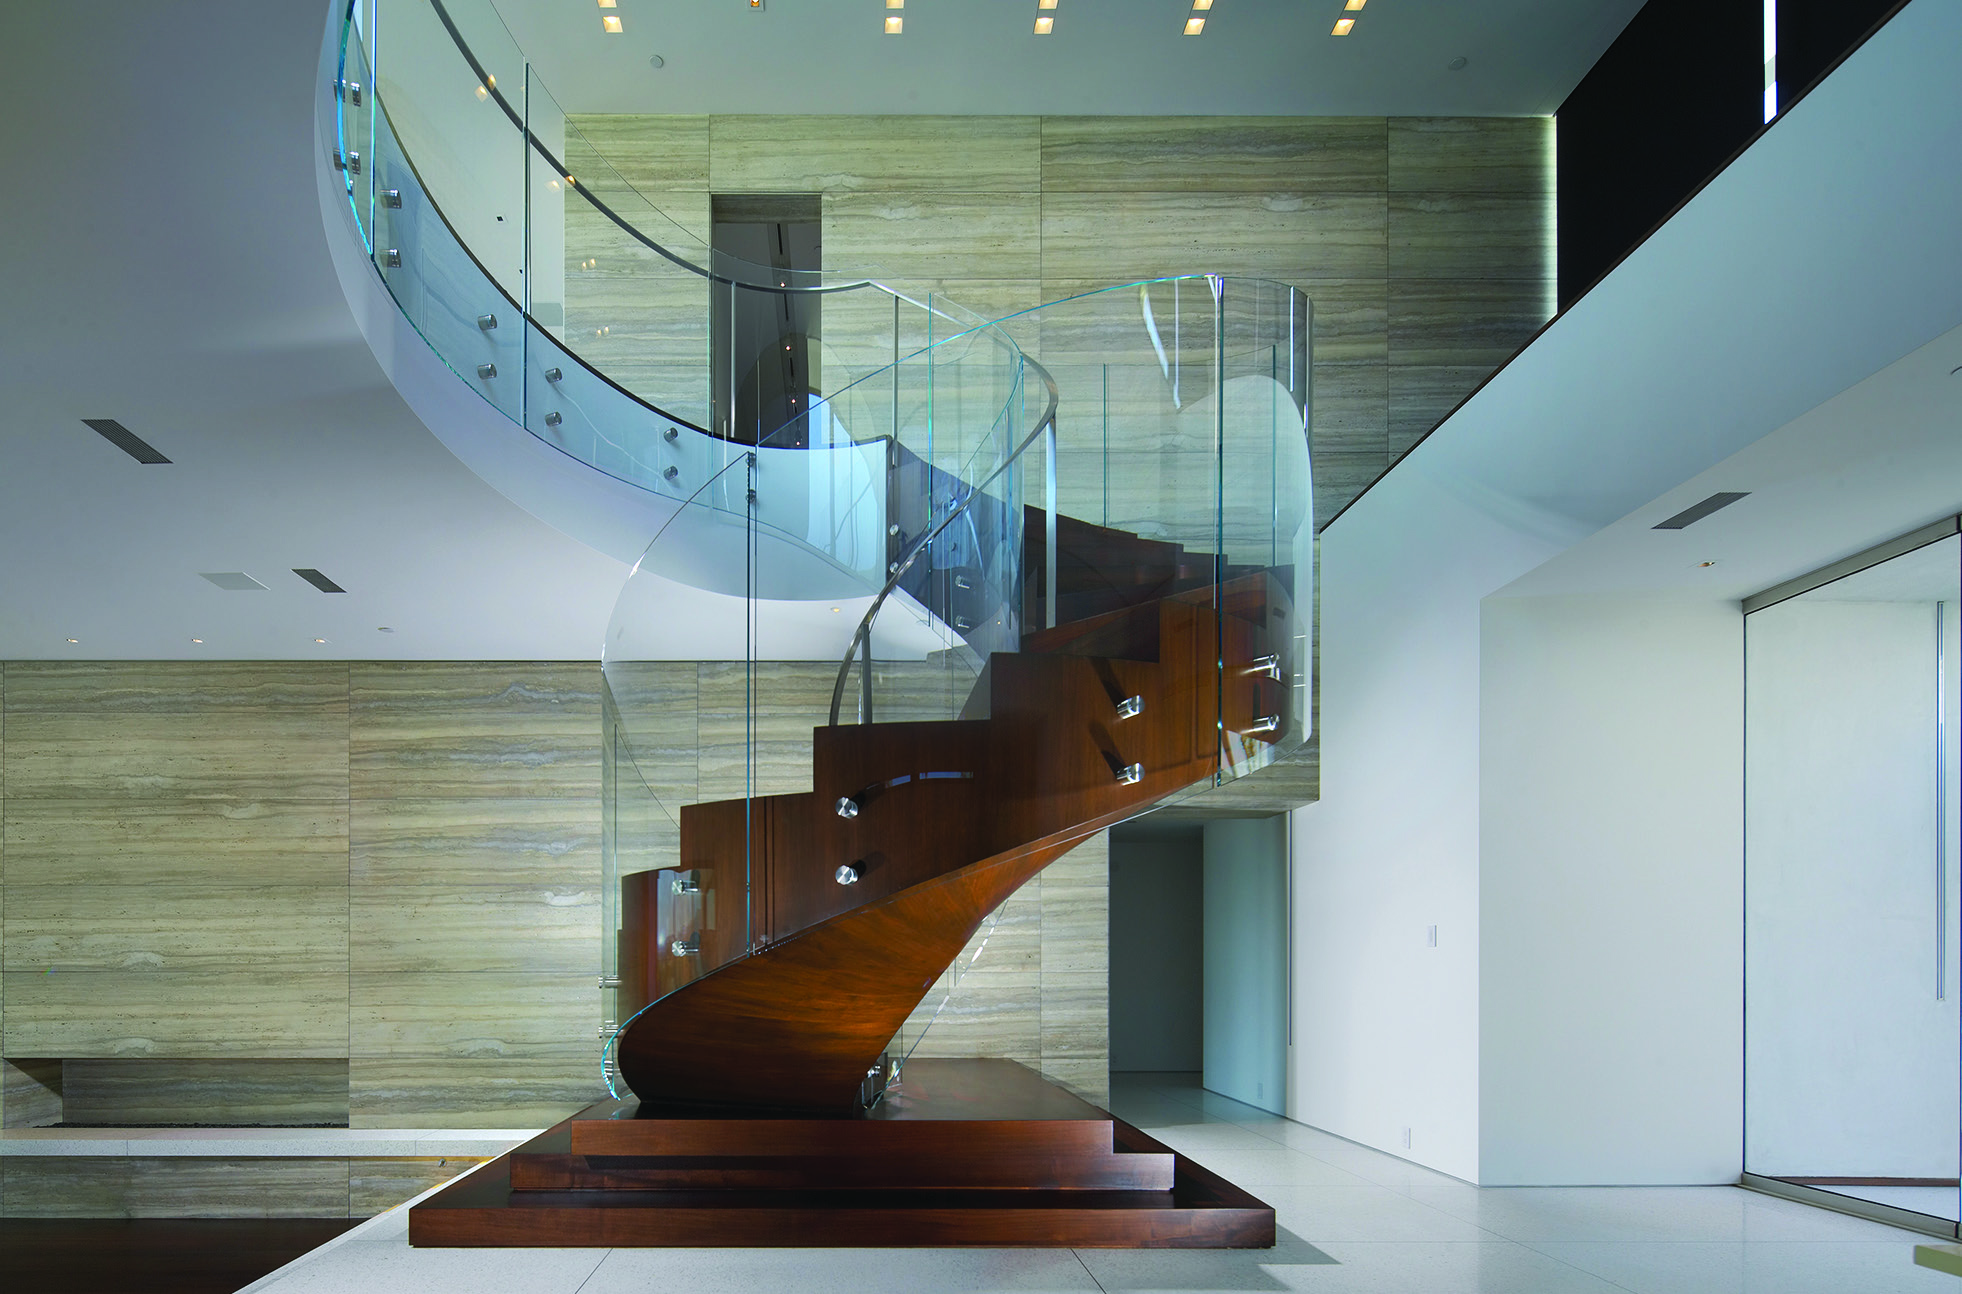 Horst-stairs.jpg